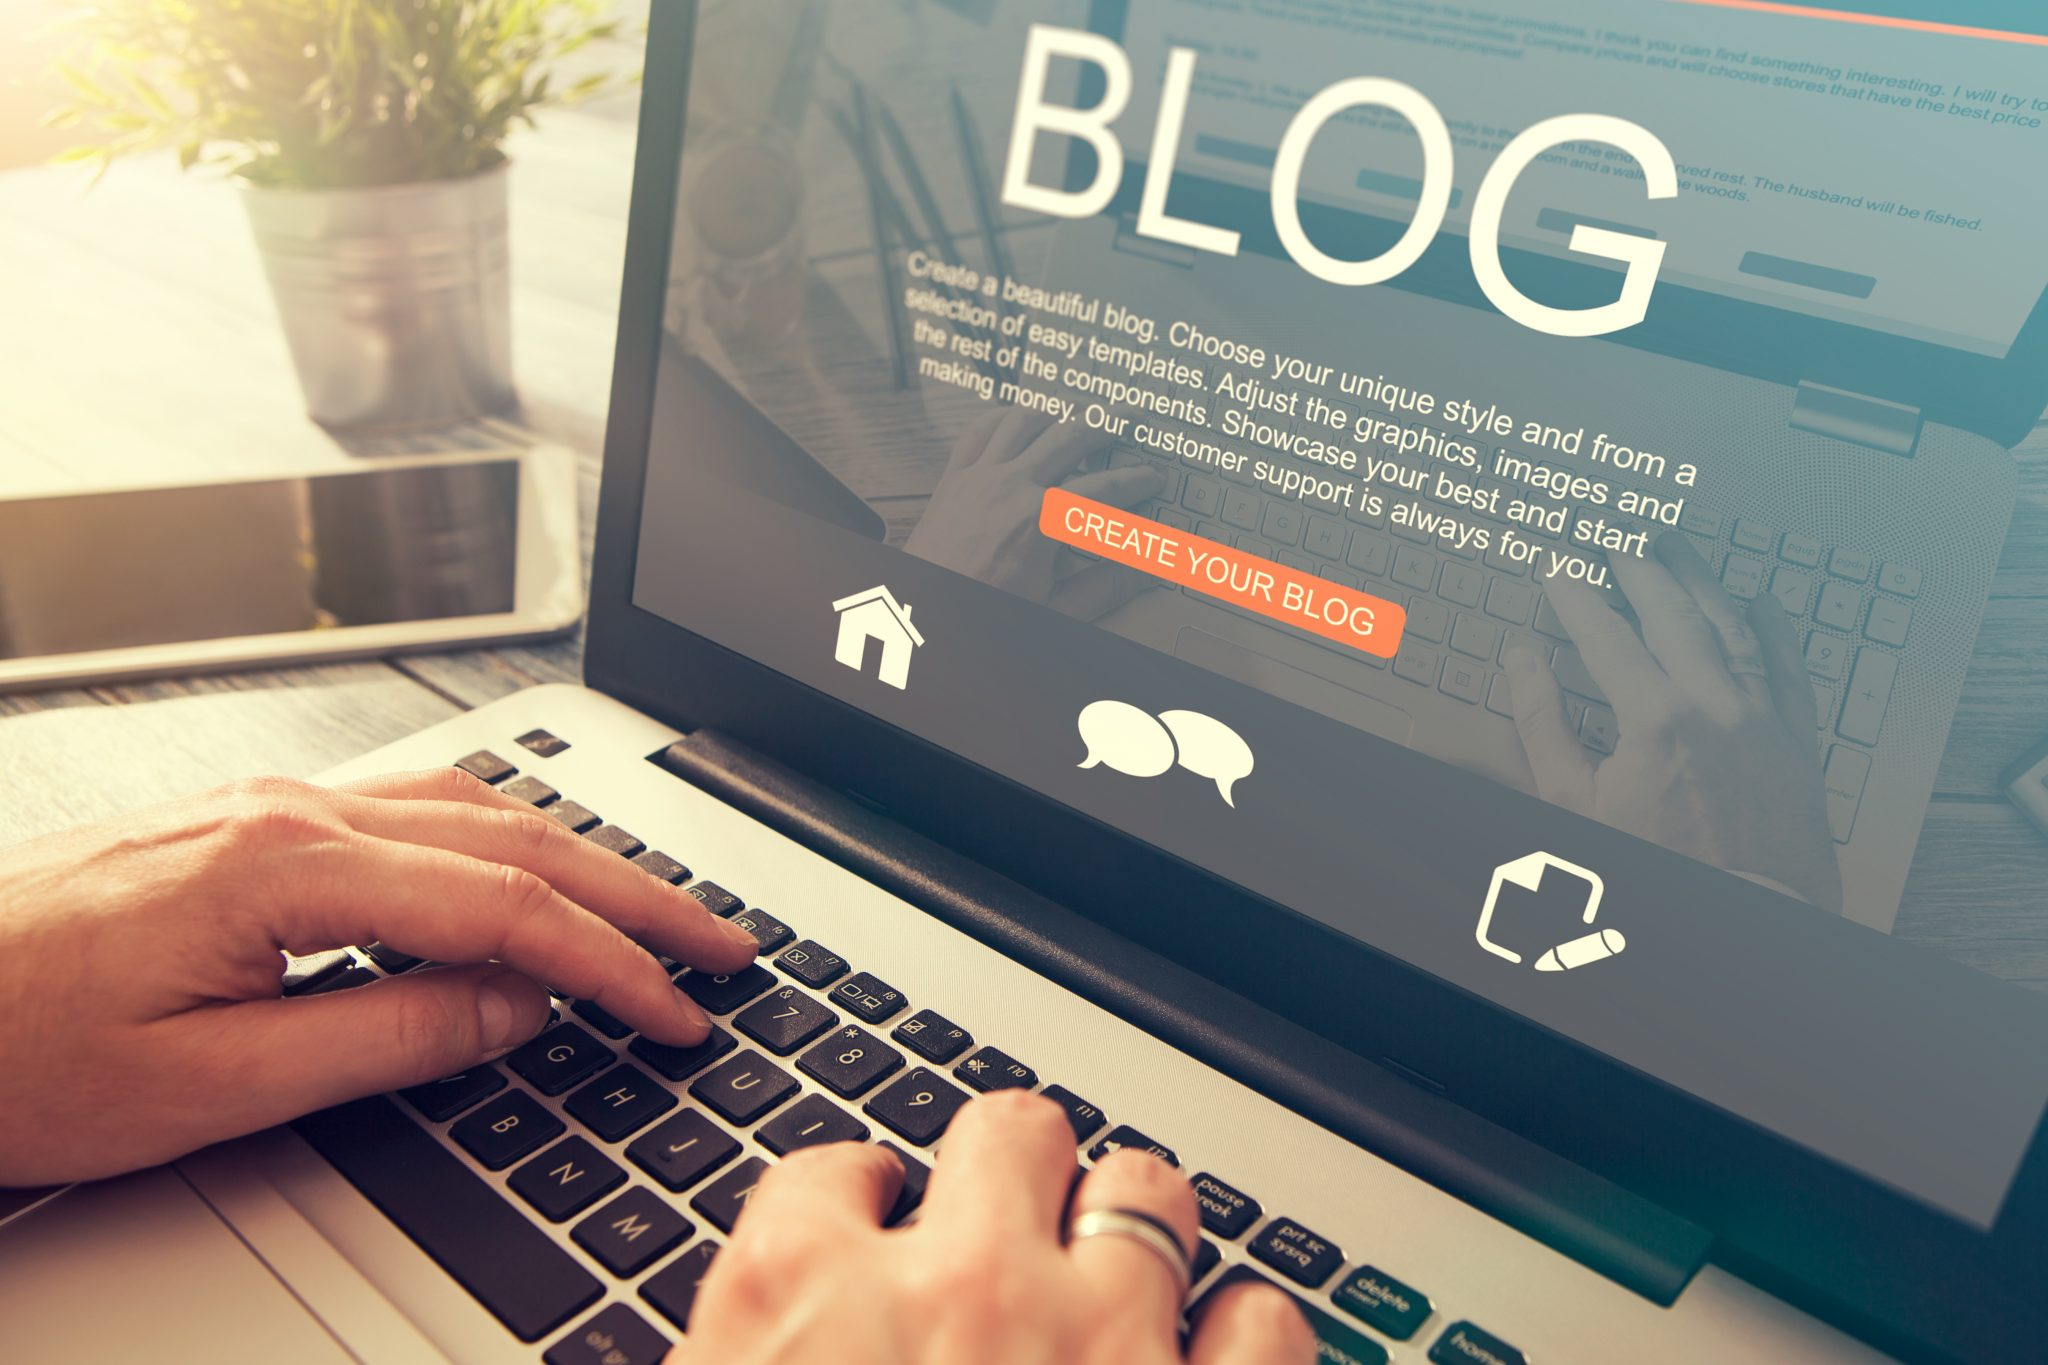 Blogging blog word coder coding using laptop